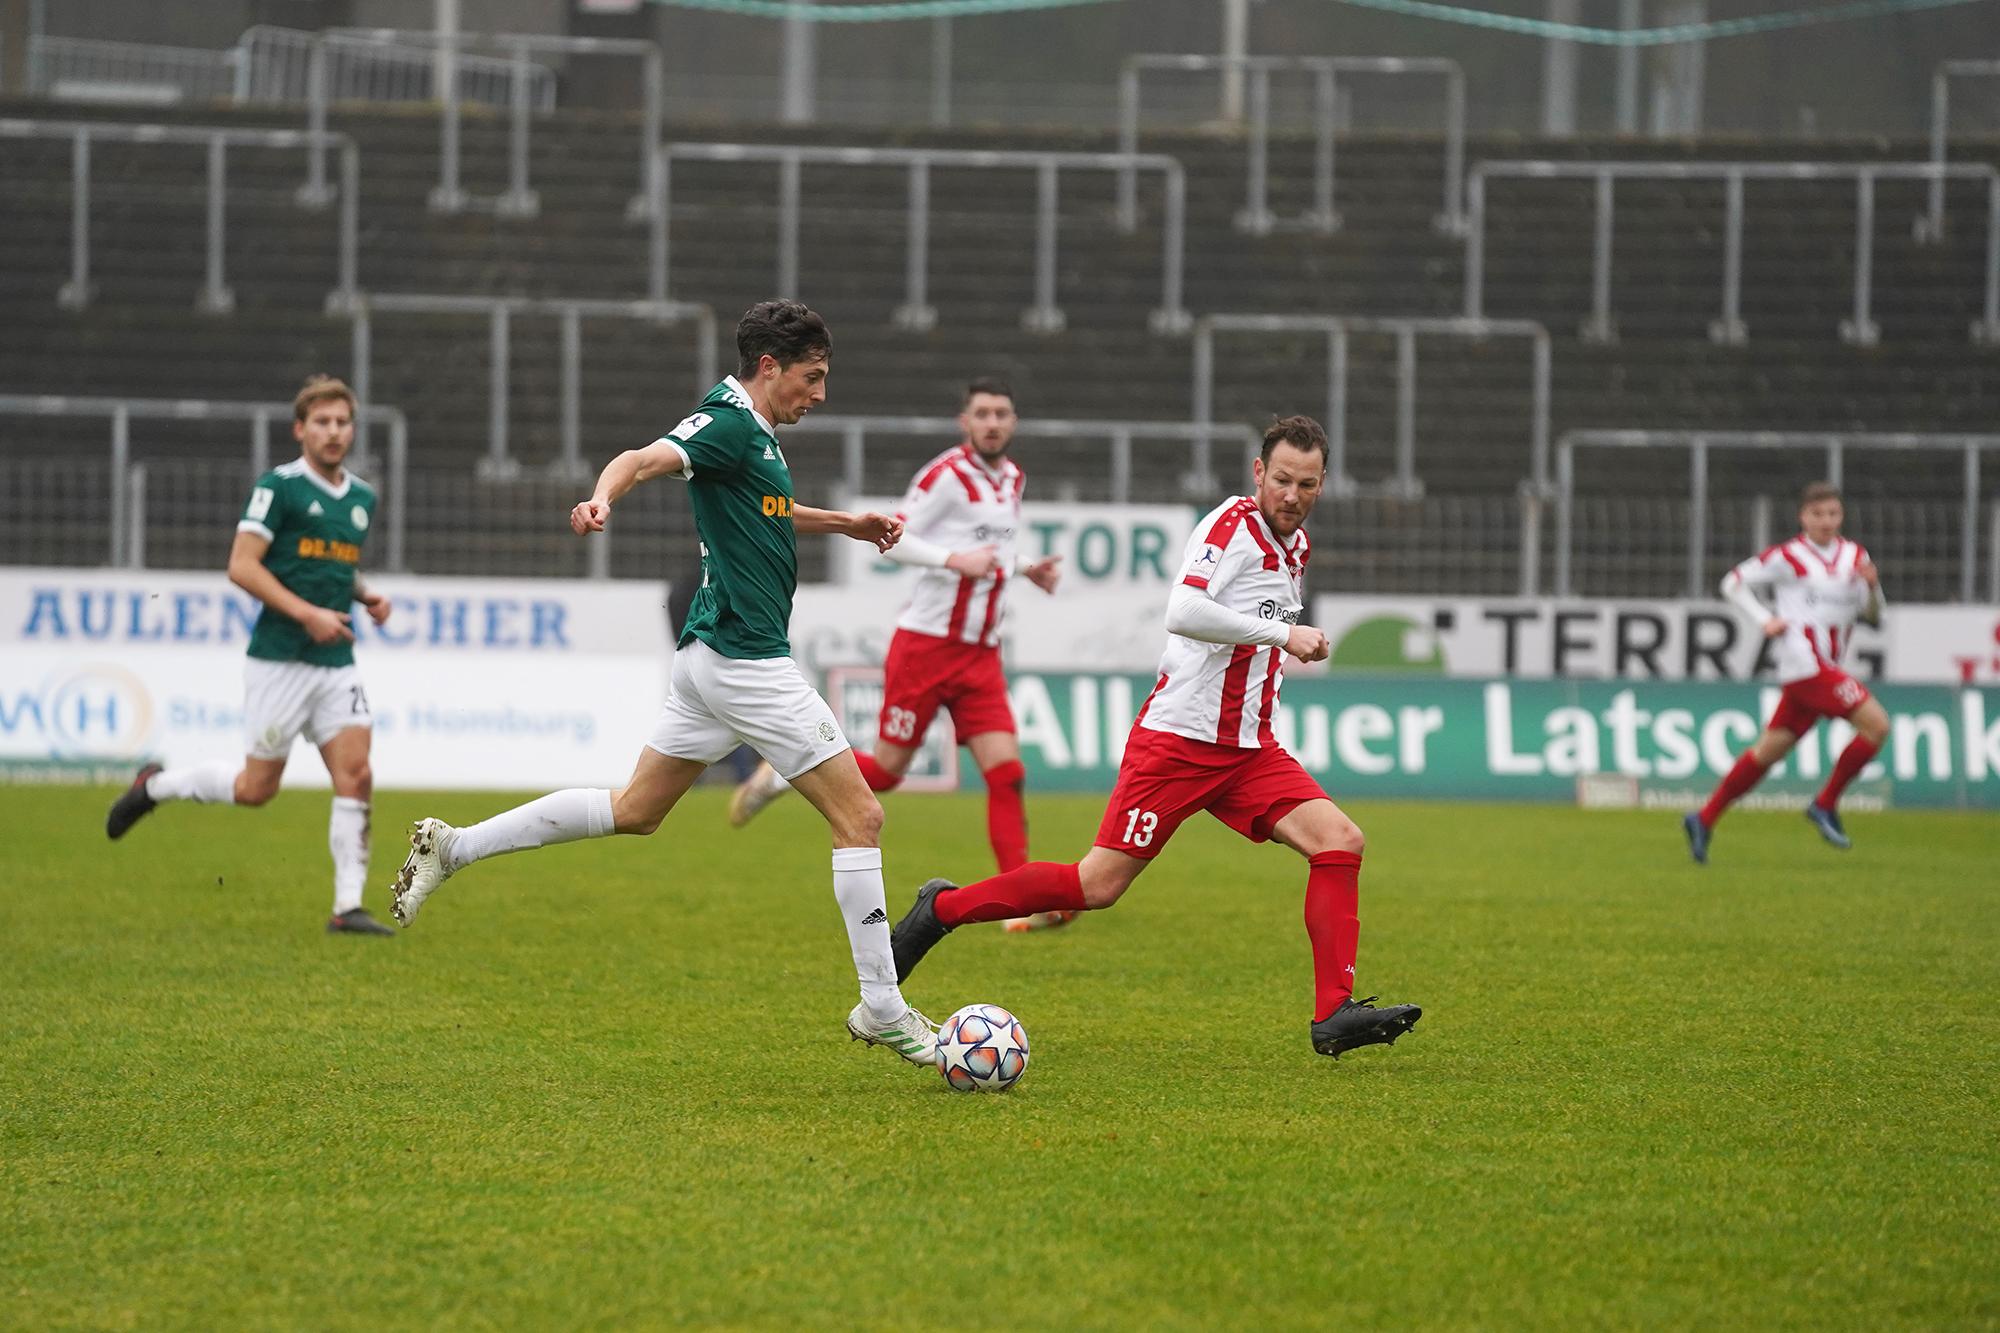 06.02.2021 | Saison 2020/21 | FC 08 Homburg | FC Gießen